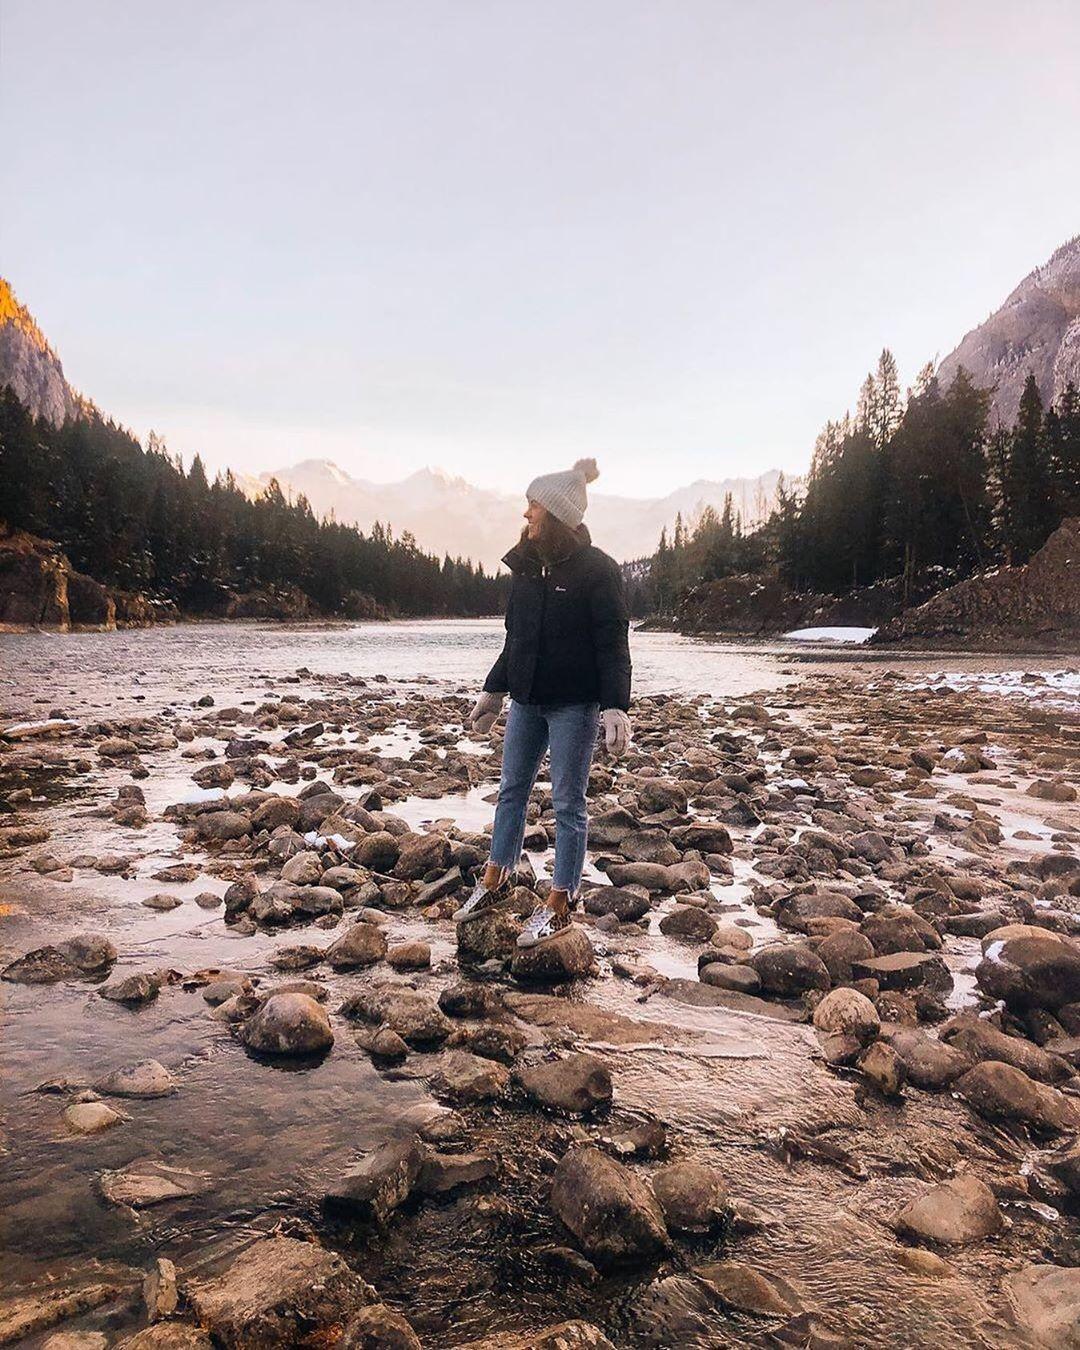 Lizadams Wearing Our Melrose Jacket In Canada This Weekend Penfield Canada Melrosejacket Natural Landmarks Photo Scenes [ 1350 x 1080 Pixel ]